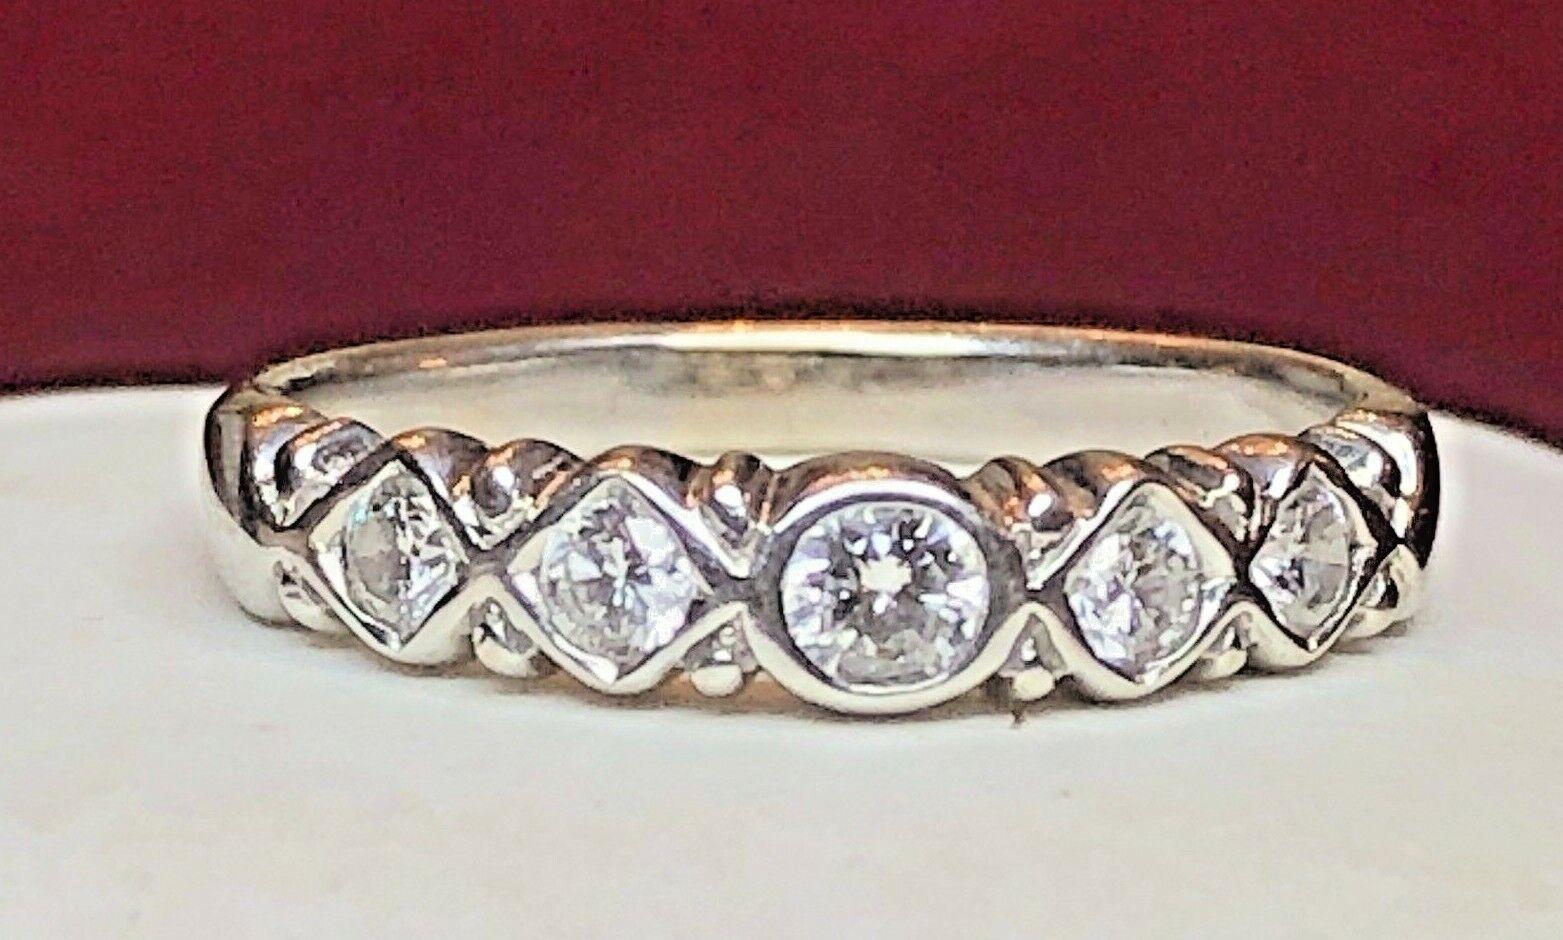 VINTAGE ESTATE 18K WHITE GOLD  RING BAND DIAMOND  SCRAPE?  ETERNITY WEDDING BAND